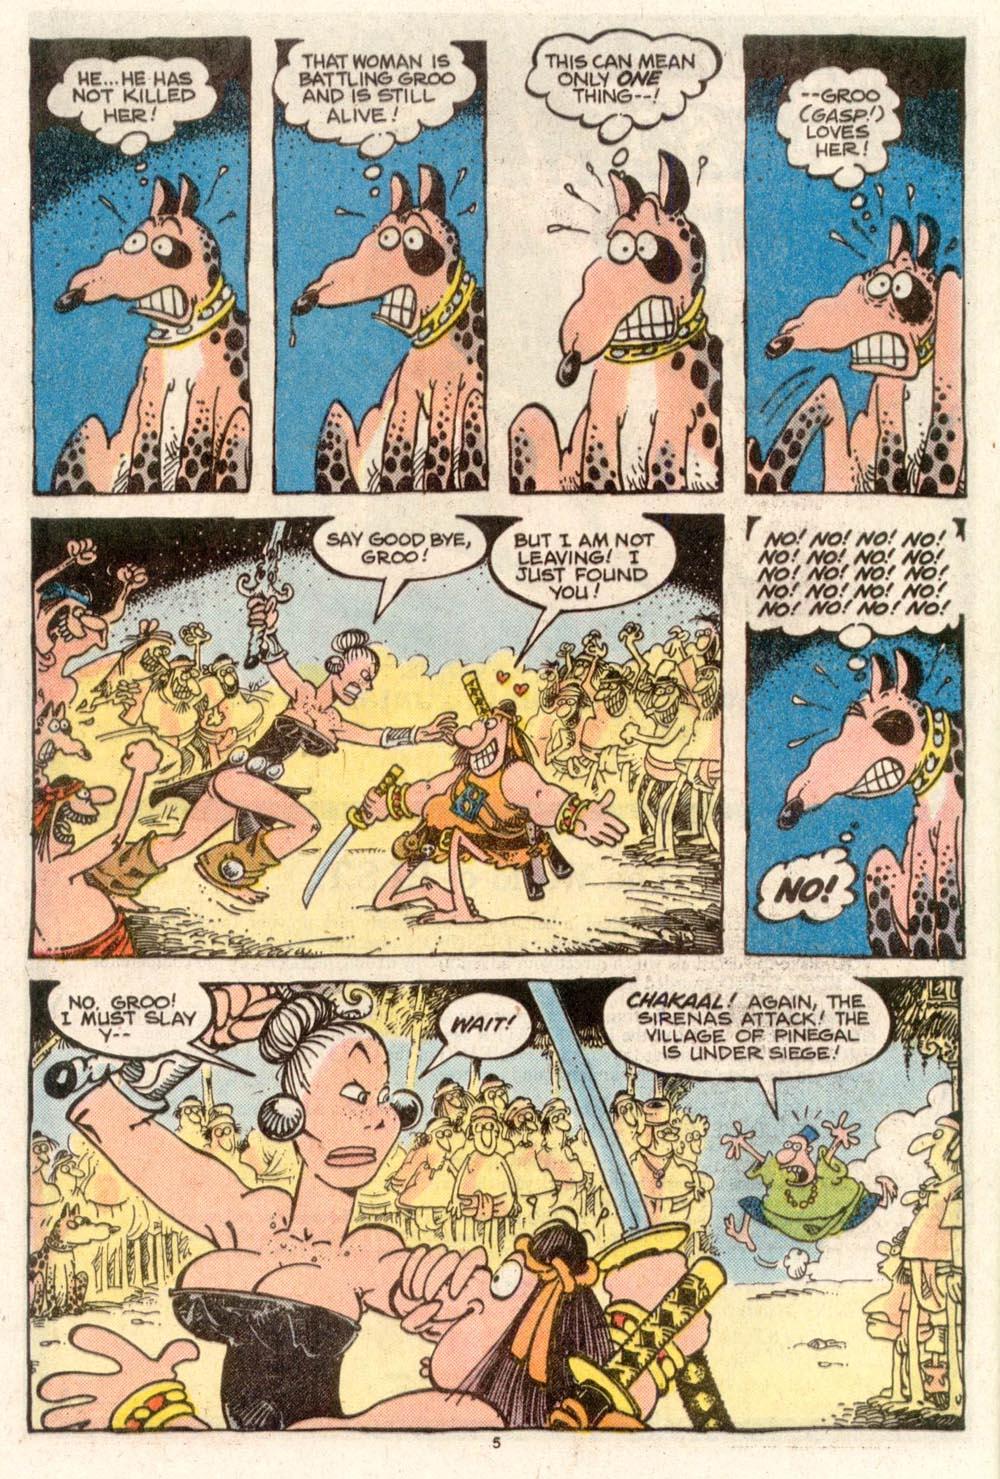 Read online Sergio Aragonés Groo the Wanderer comic -  Issue #50 - 5